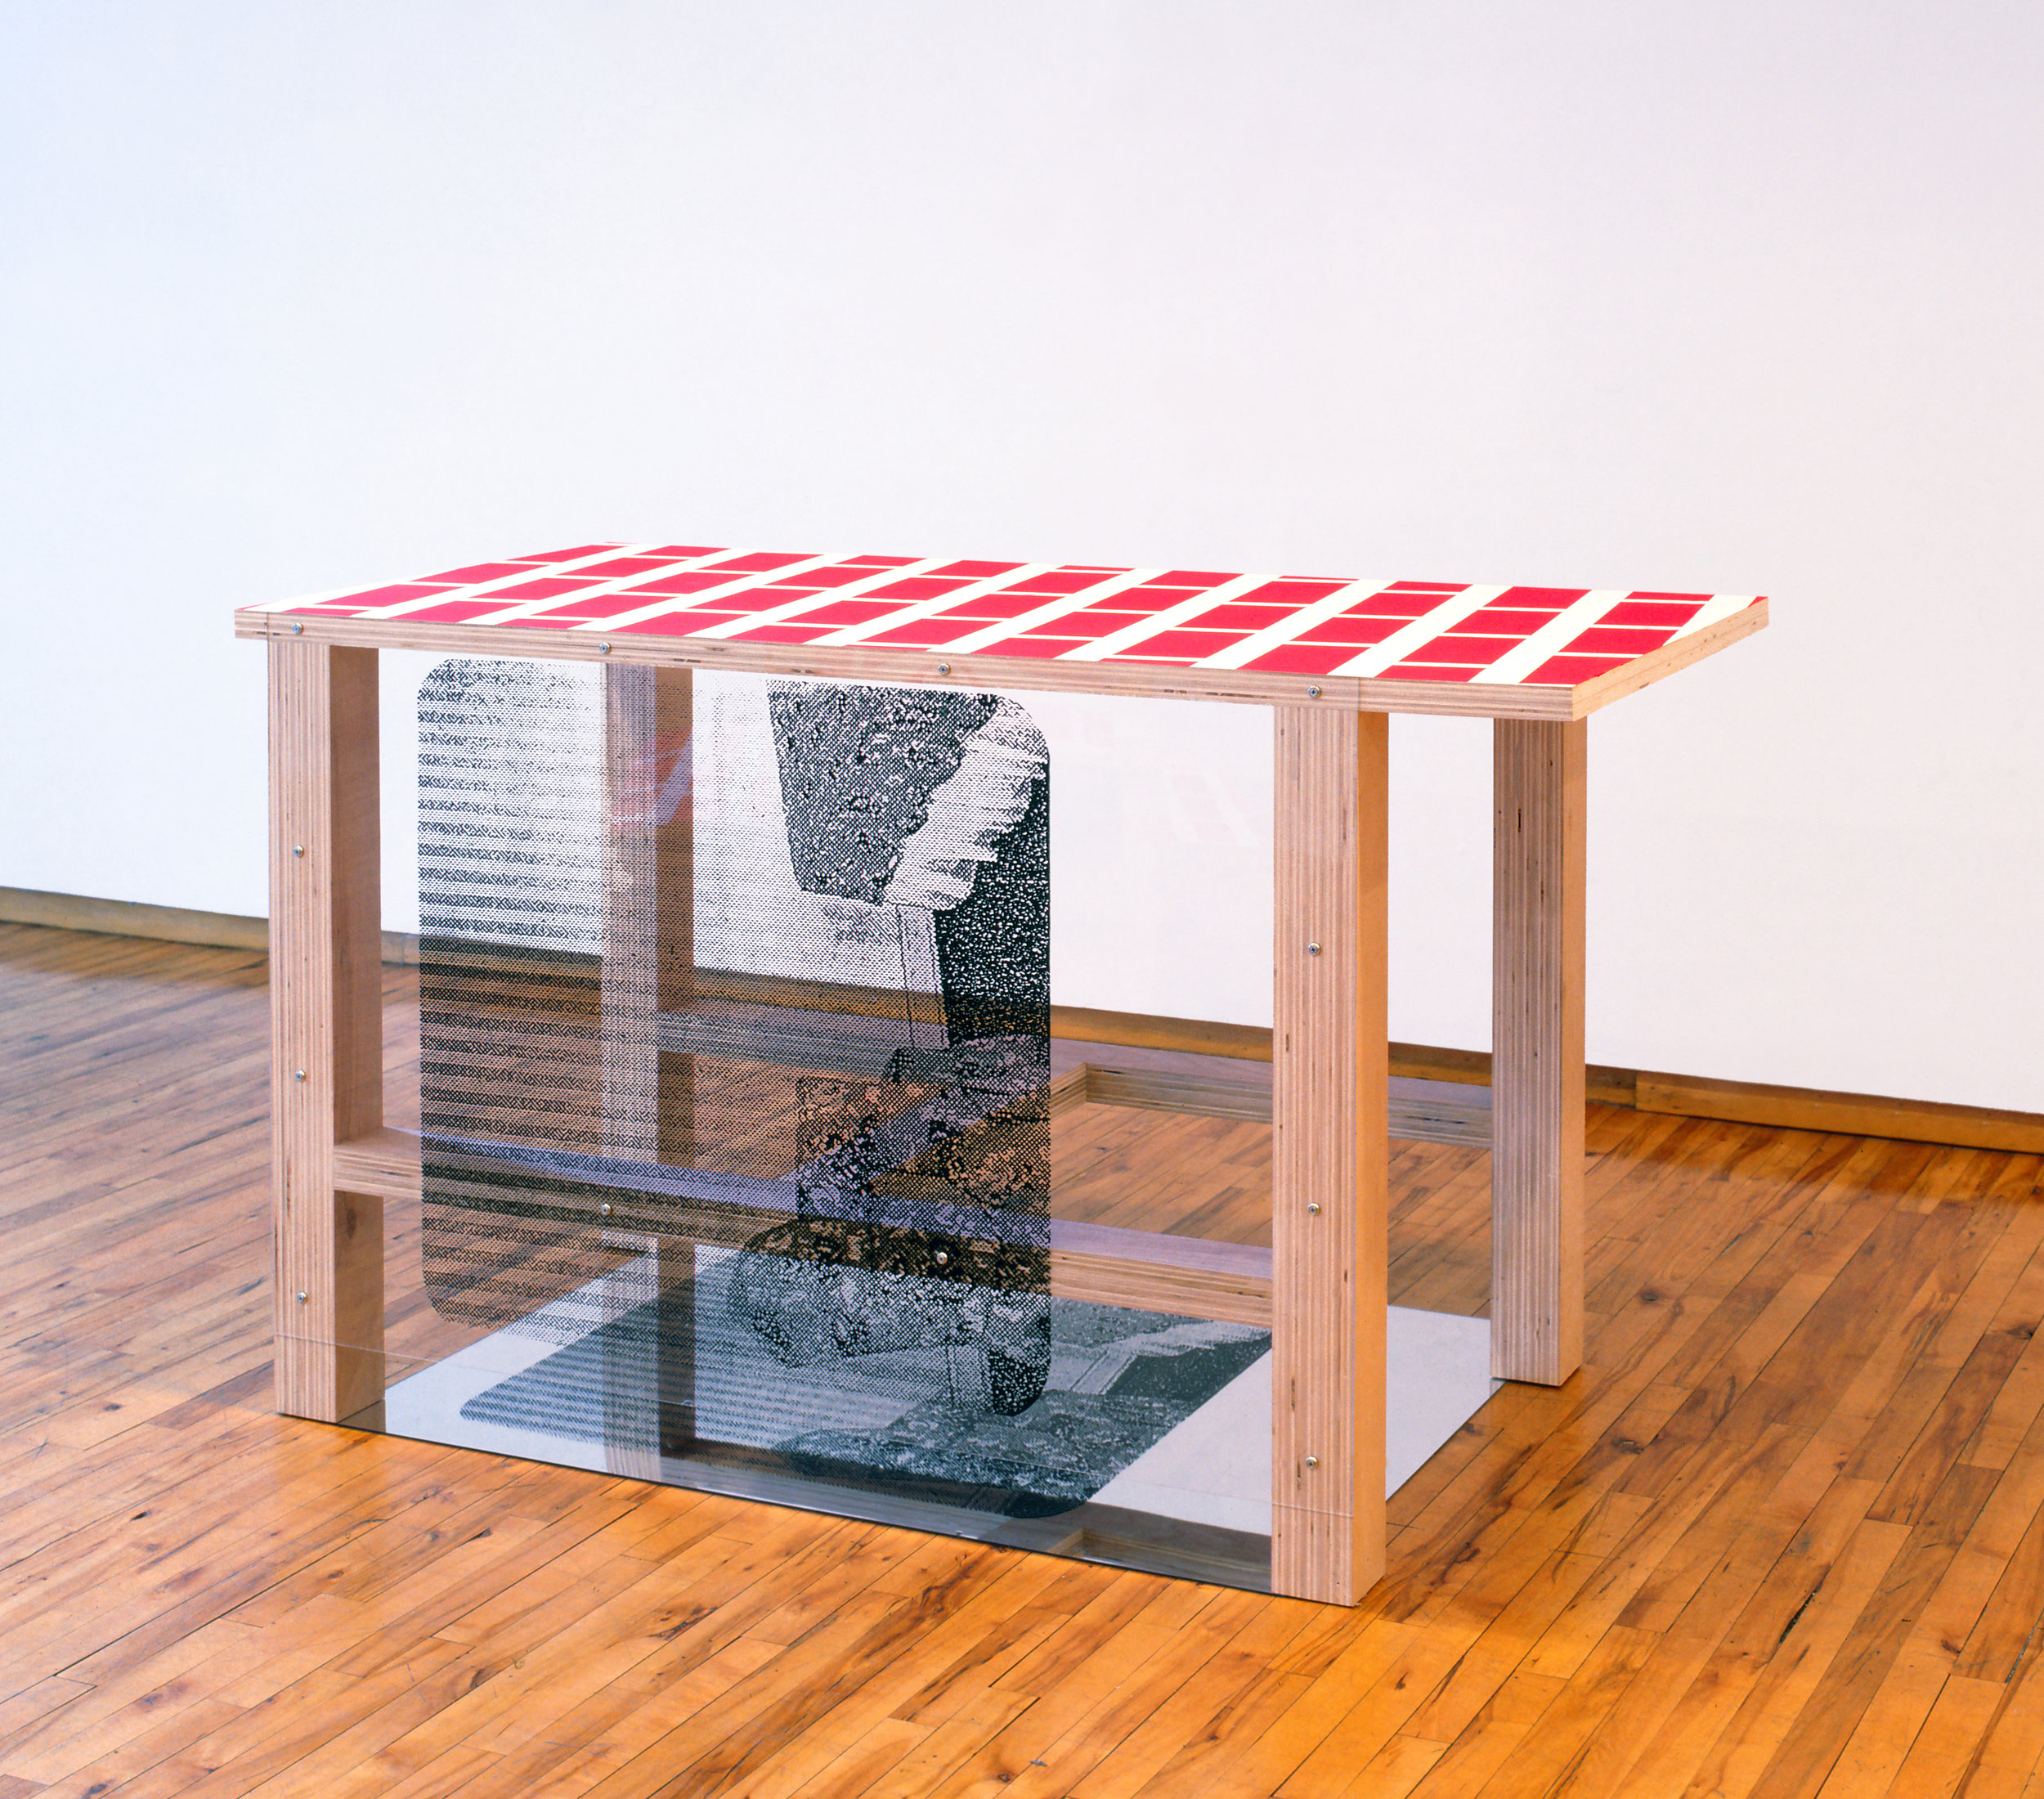 Pello Irazu   Room Under , 1995 Plywood, vinyl paint, adhesive tape, and silkscreen on mirror 113 x 142.5 x 94 cm Collection of the artist © VEGAP, Bilbao, 2017